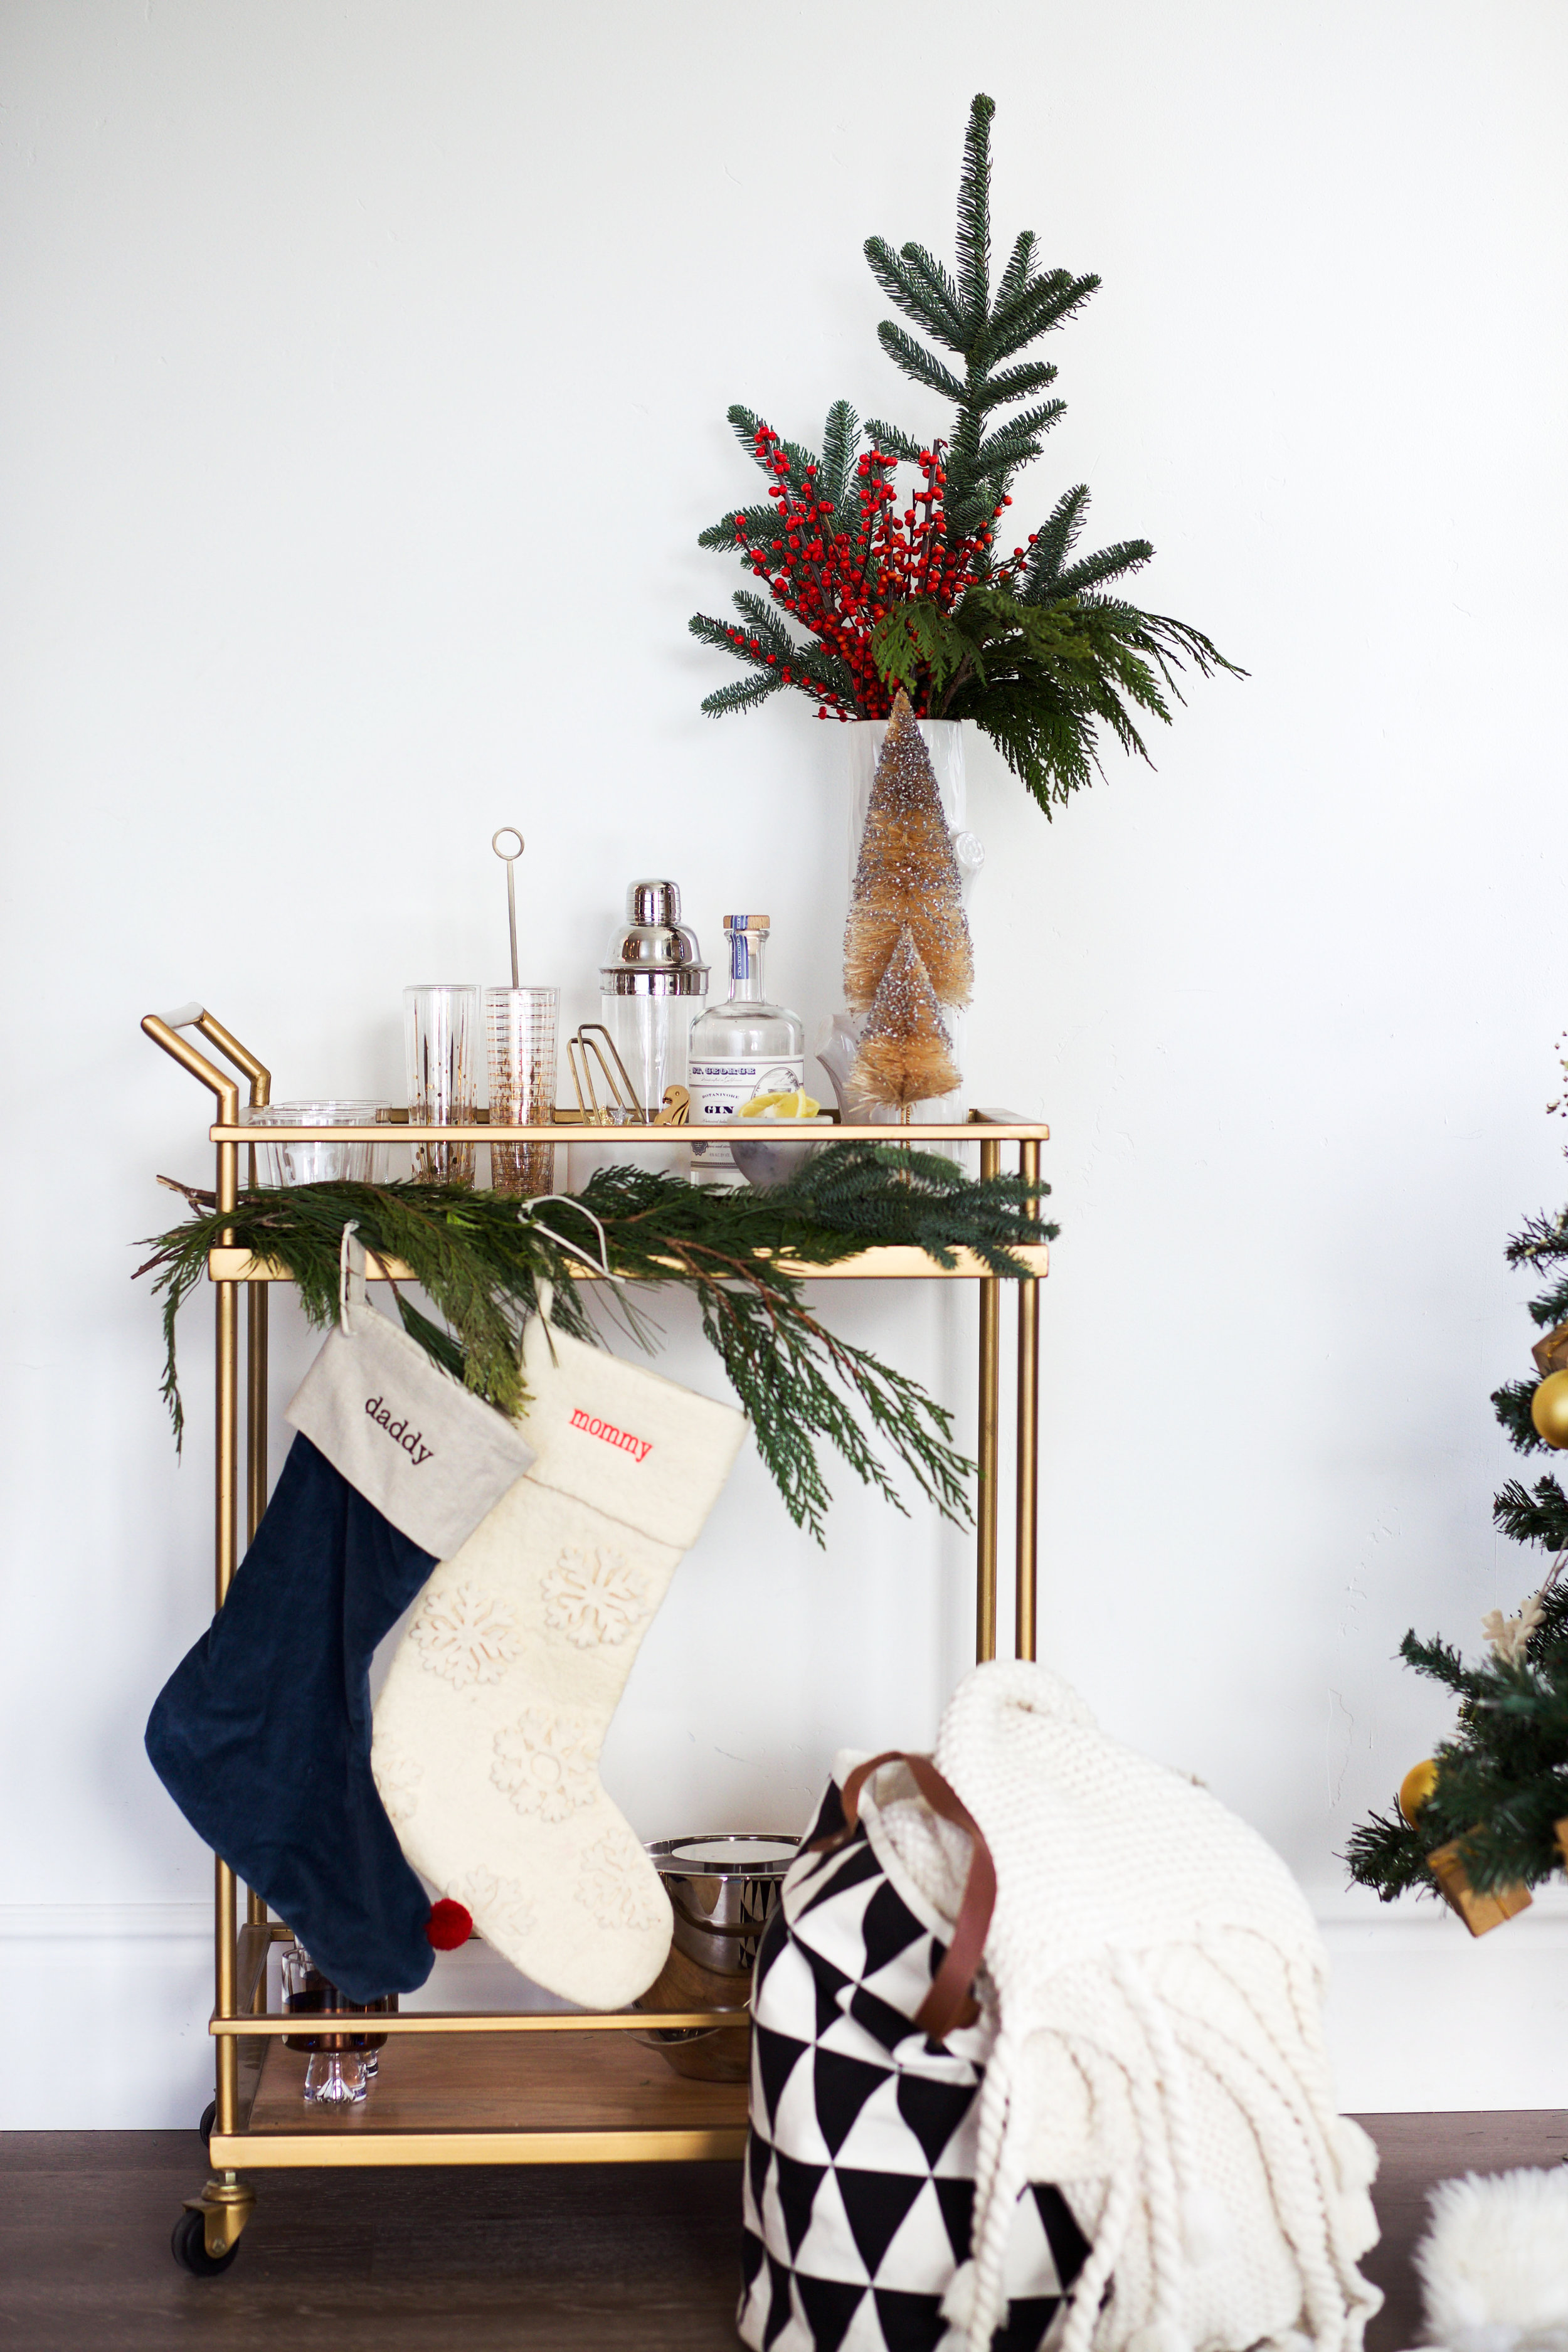 Christmas_Bar_Cart_Stockings_Cocktail_Home_Decor.jpg